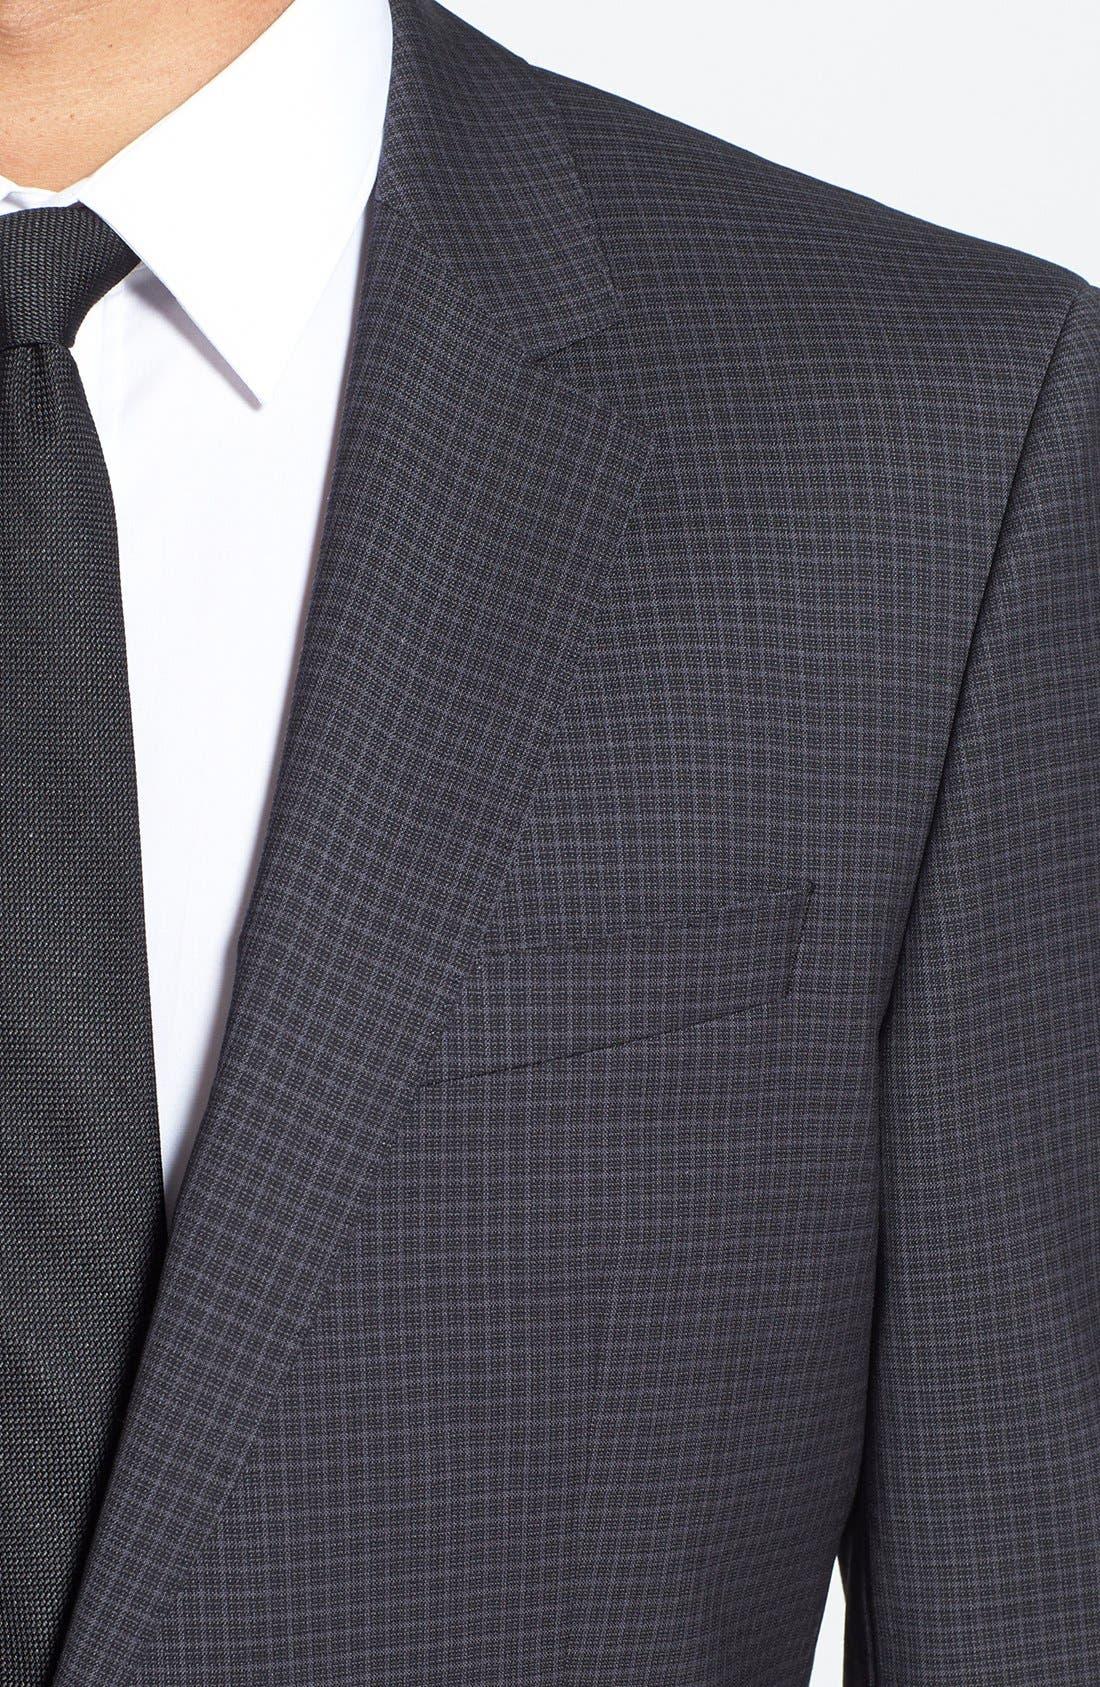 Alternate Image 5  - BOSS HUGO BOSS 'Huge/Genius' Trim Fit Check Suit